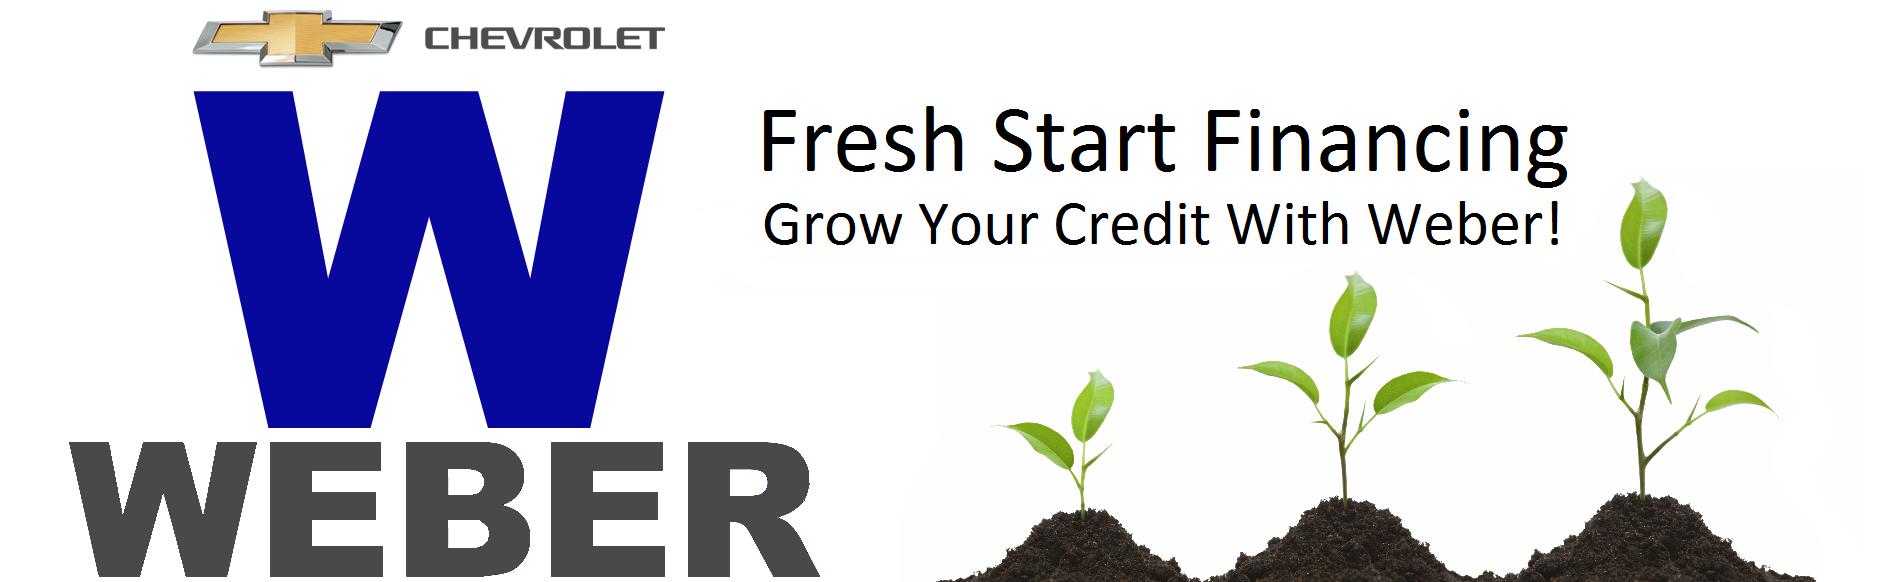 Weber Chevrolet Granite City Il >> Fresh Start | Chevrolet Dealer | auto financing | Chevy ...